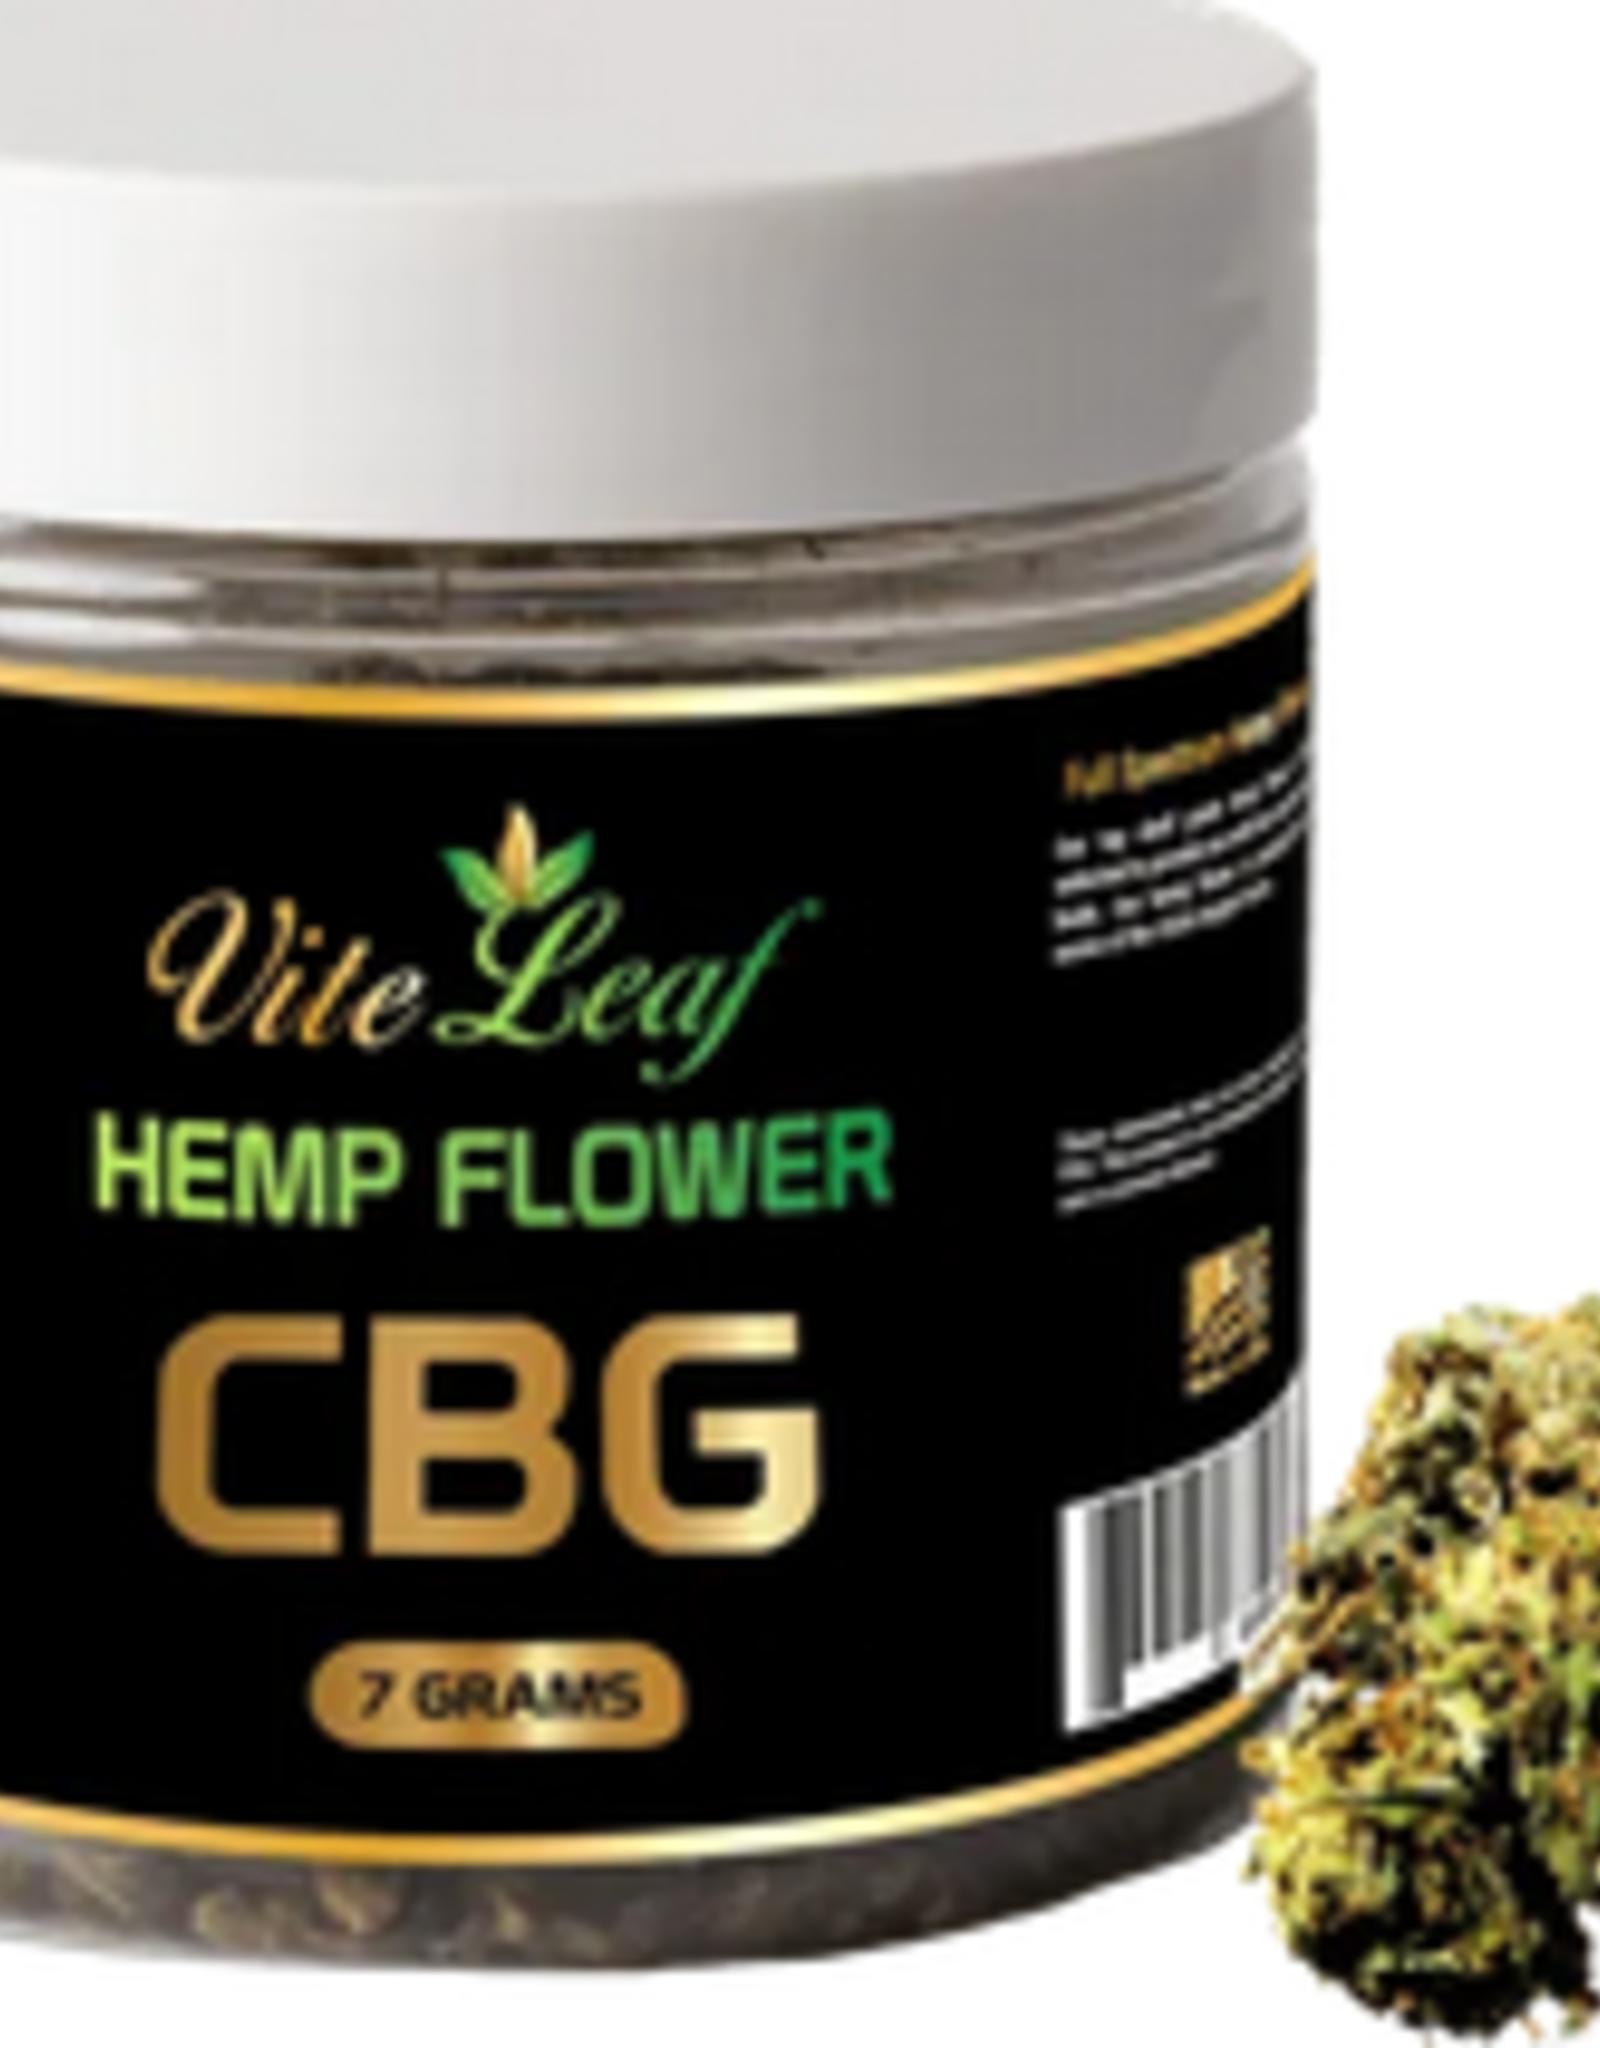 Vite Leaf CBG Hemp Flower 10-20% 7g .3% THC